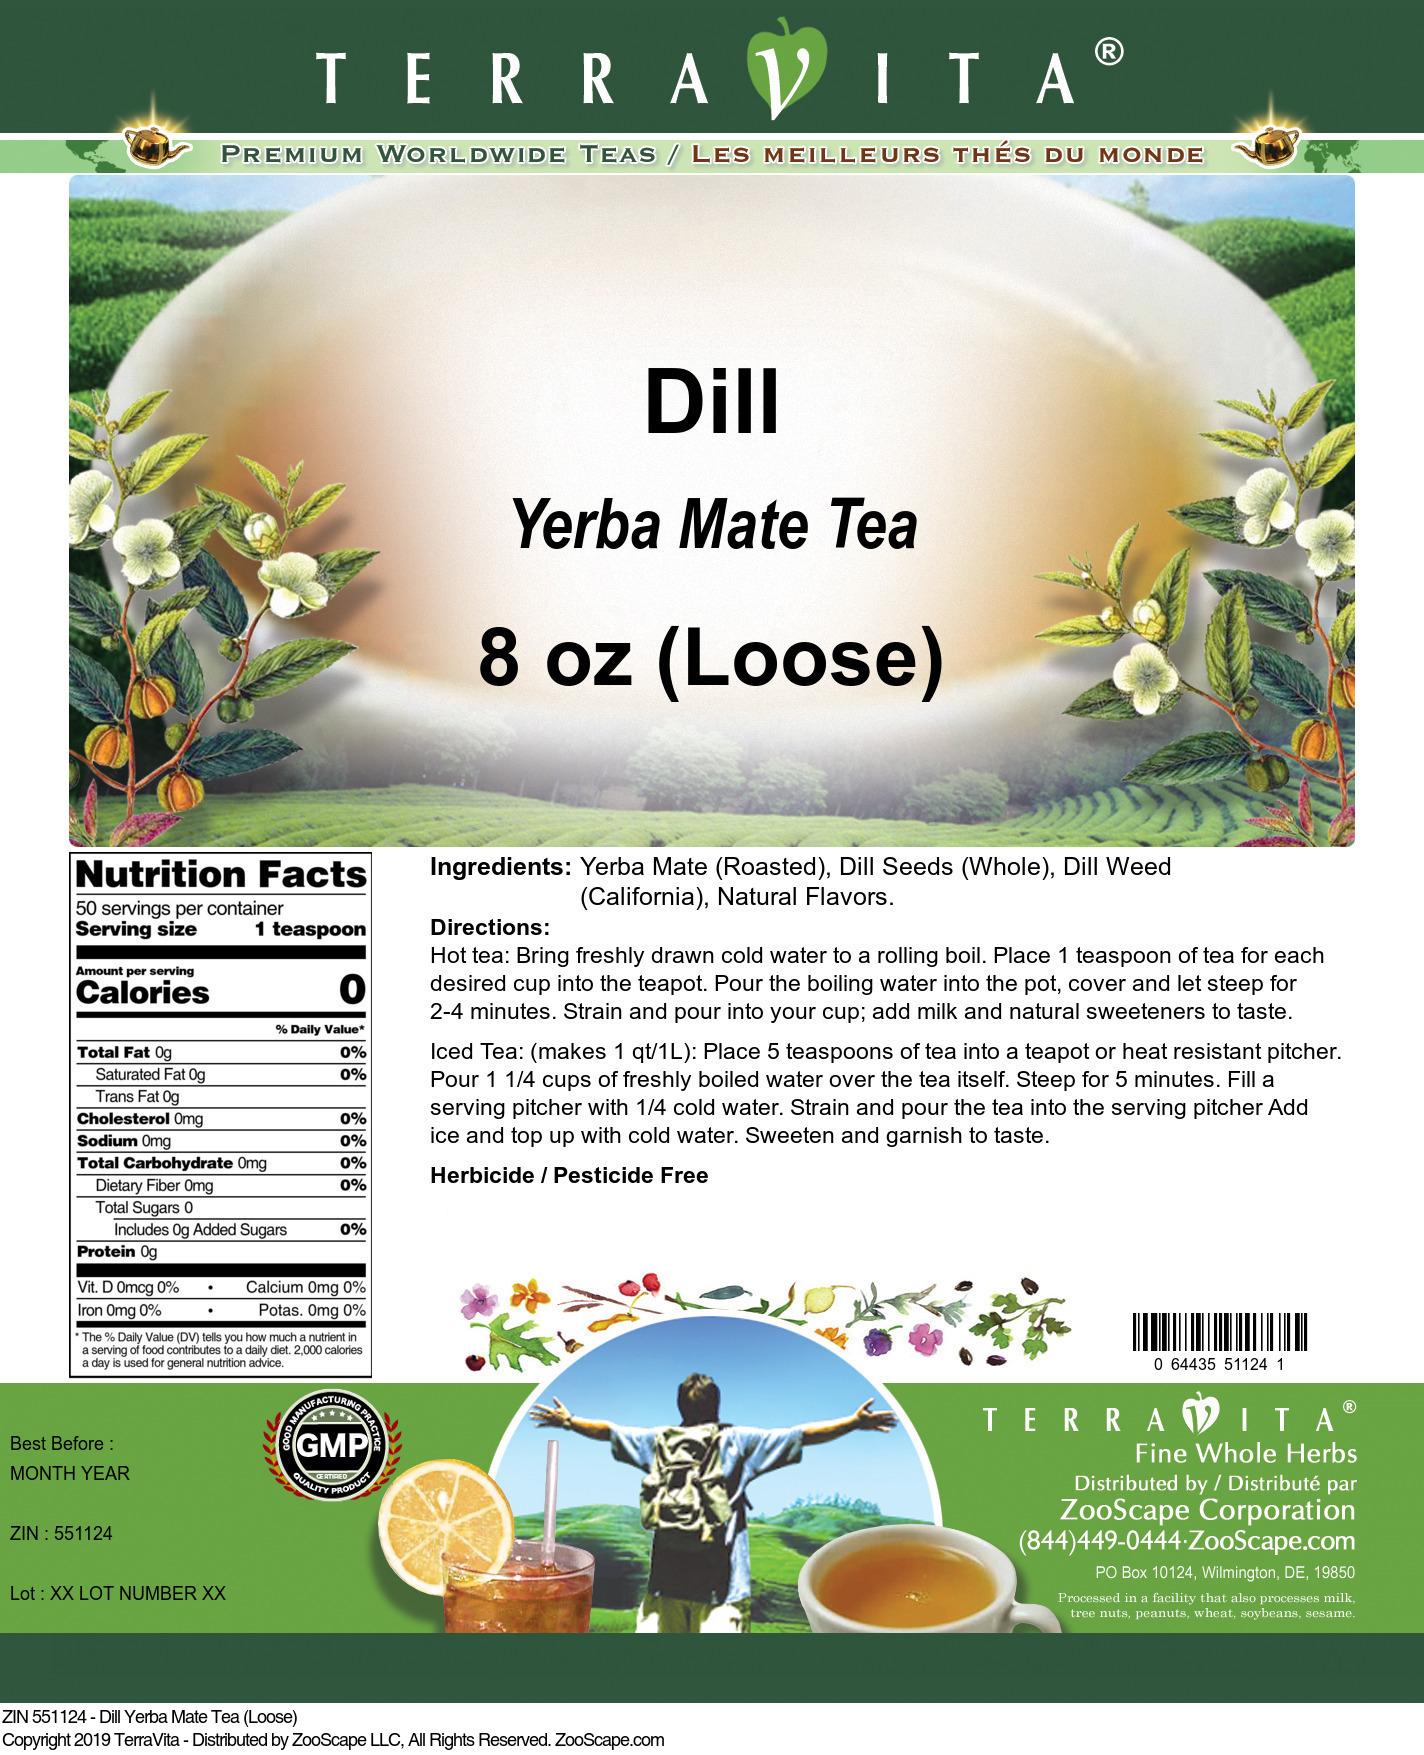 Dill Yerba Mate Tea (Loose)